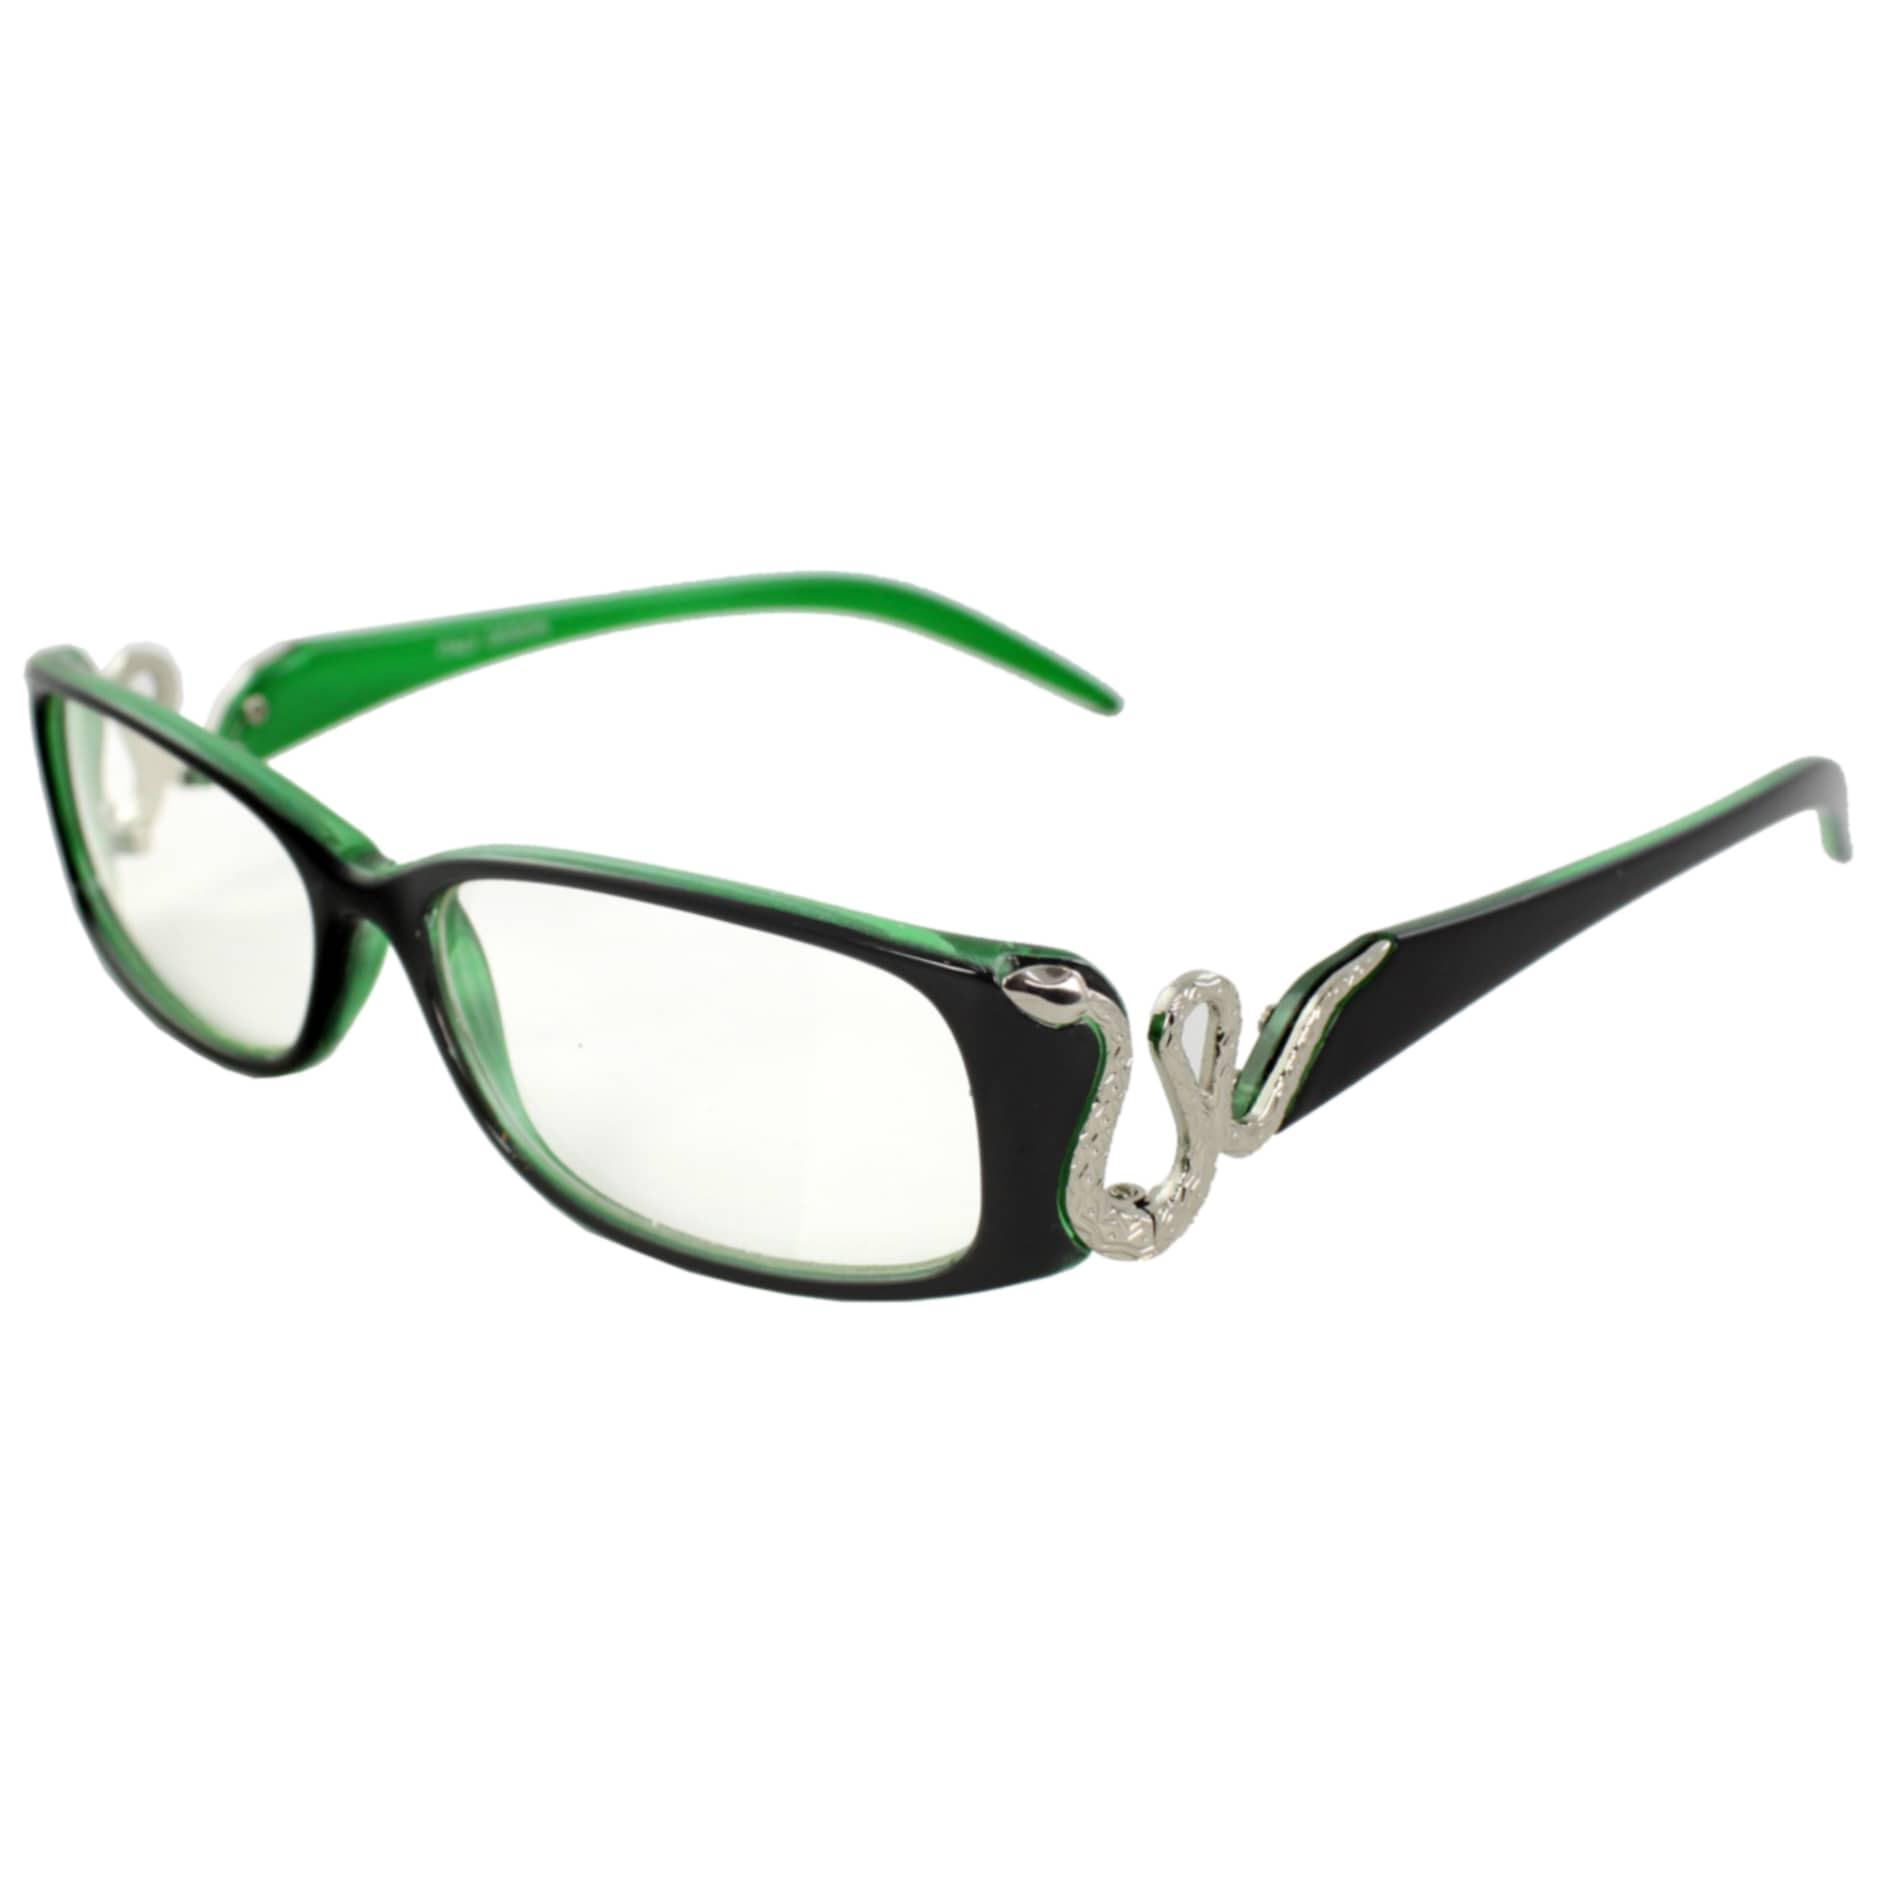 MLC Eyewear Men's PB828CL-BKGNCL Black/Green Clear Sunglasses